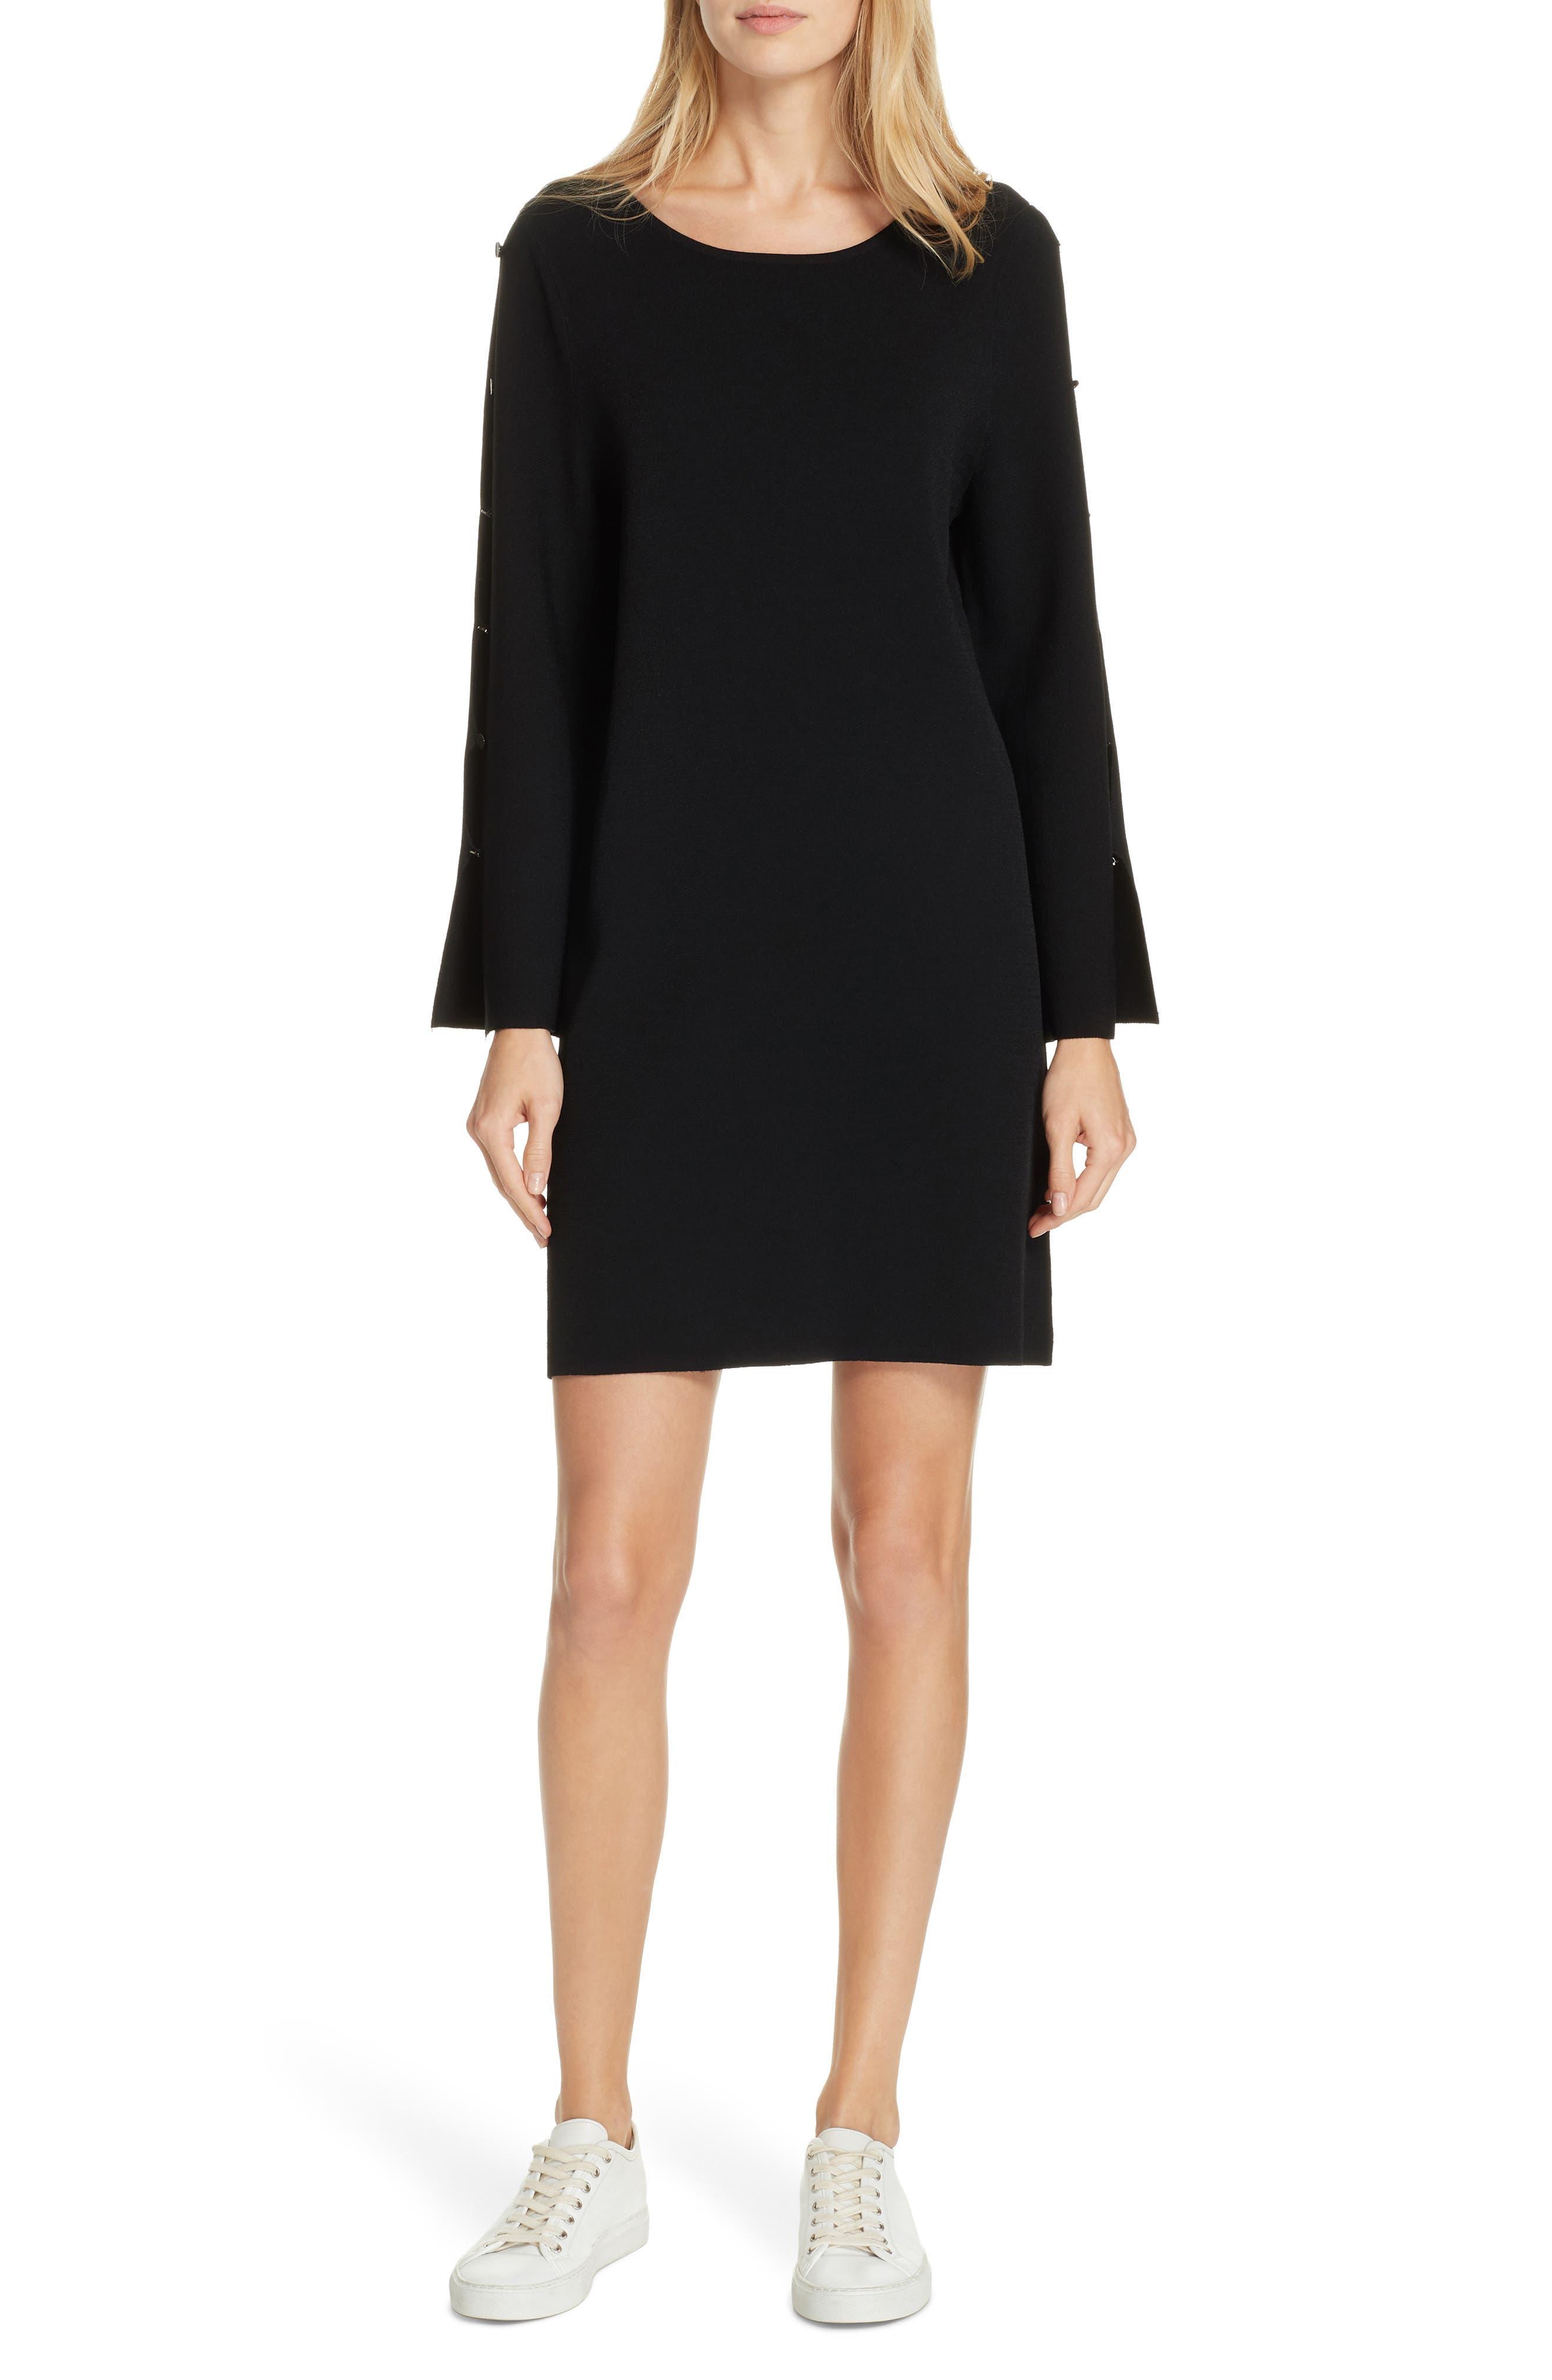 Milly Button Sleeve Shift Dress, Size Petite - Black